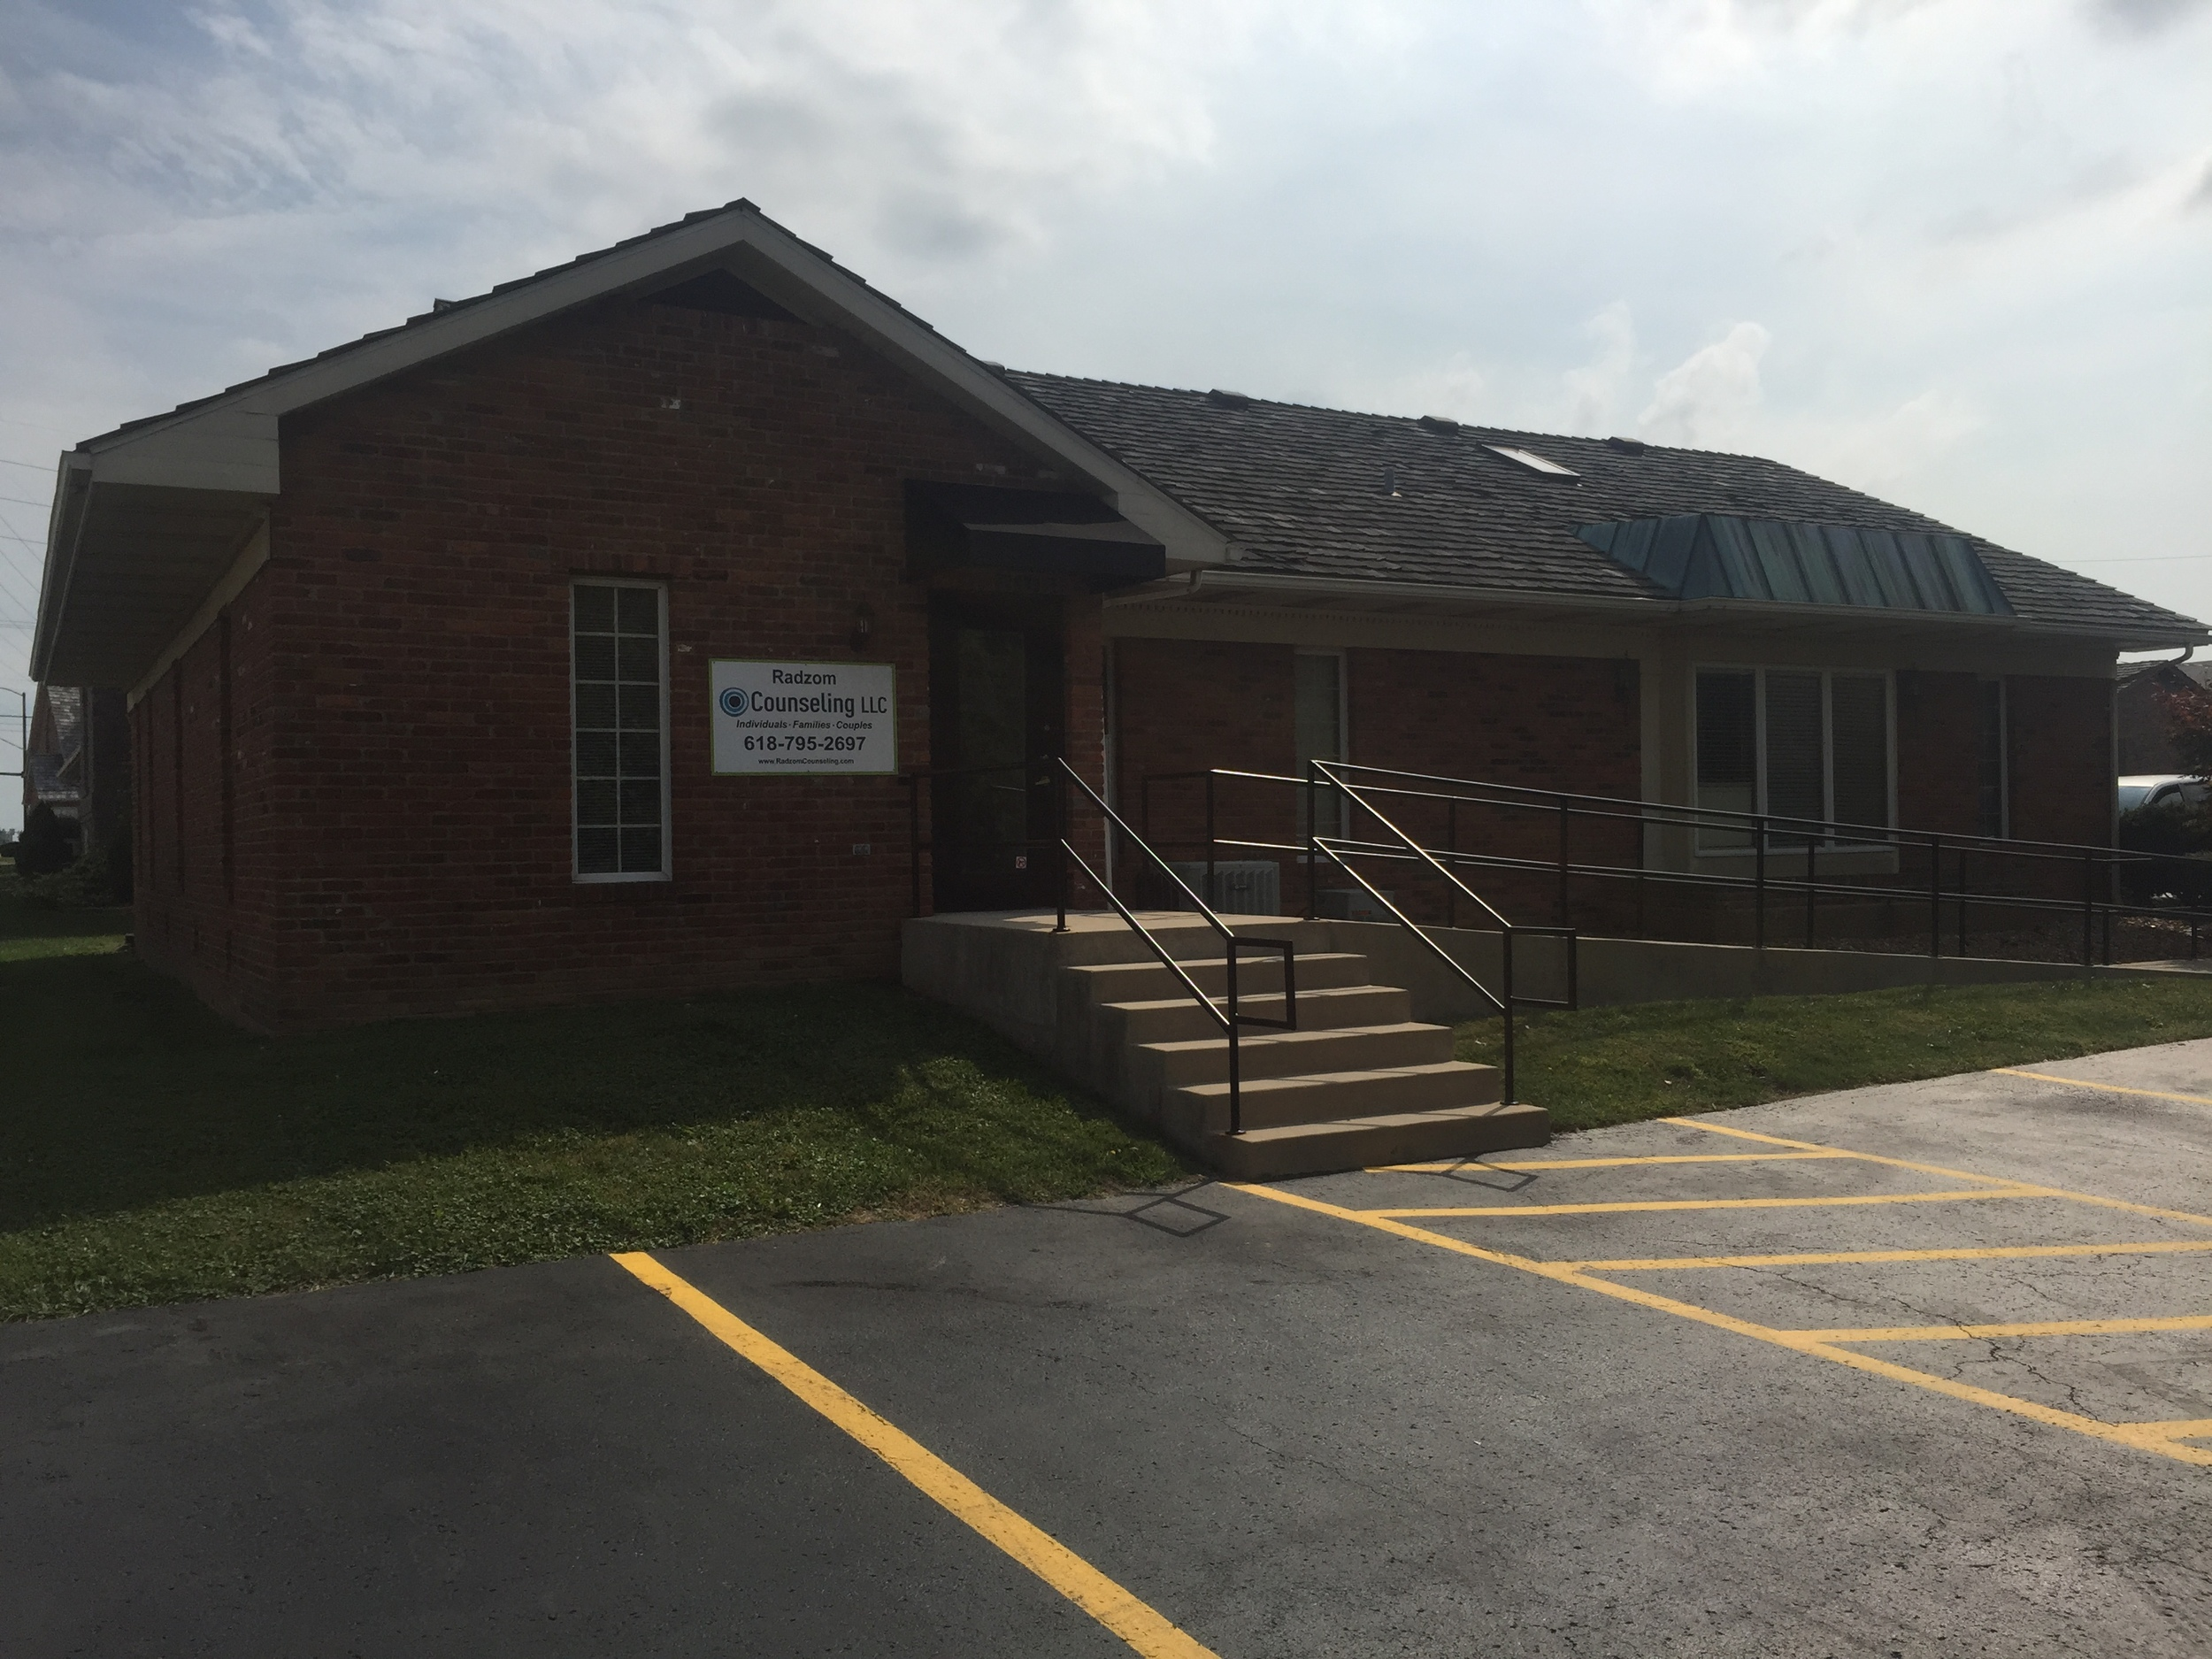 Radzom Counseling Exterior 40 B Edwardsville Prof Park Dr in Edwardsville, IL